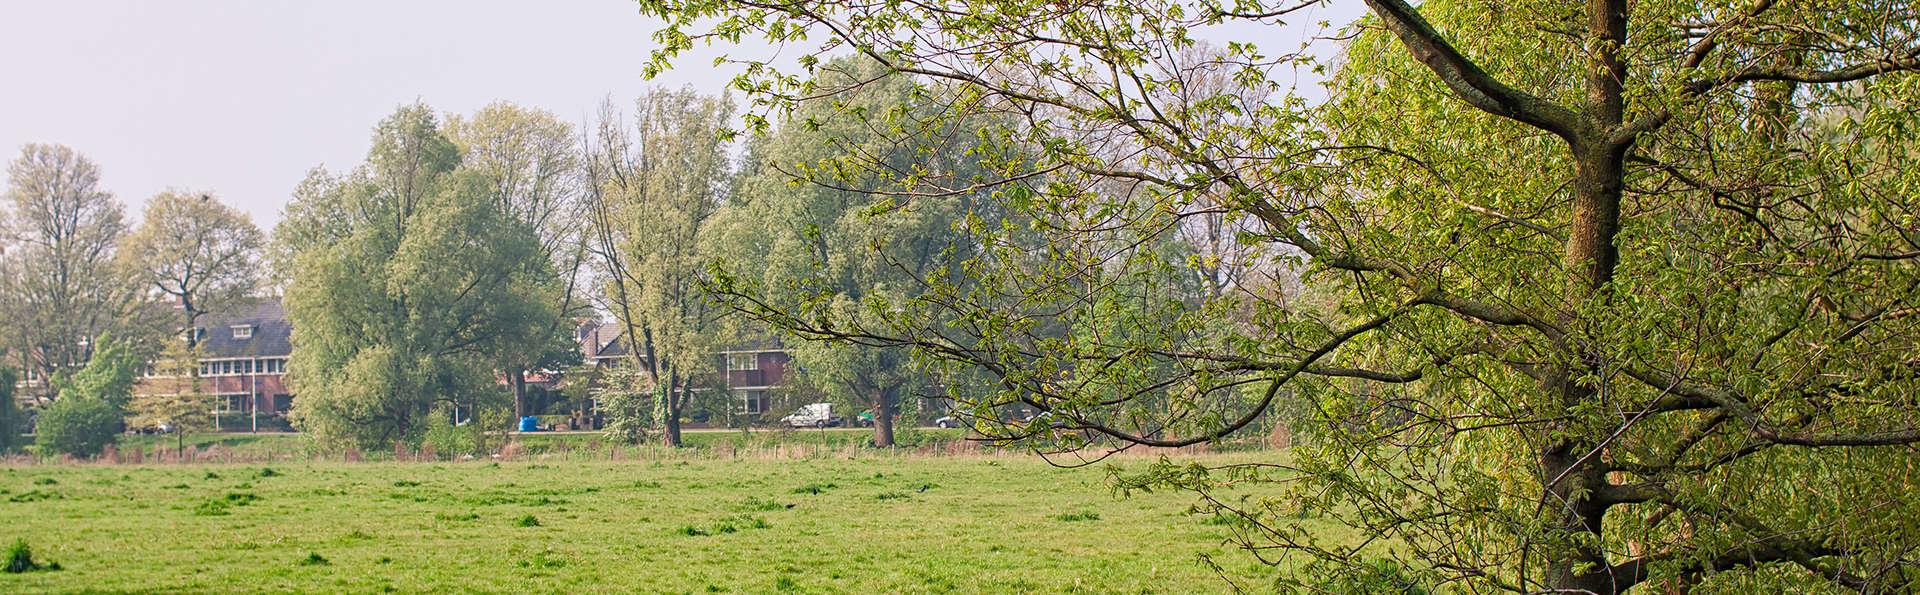 Bastion Hotel Bussum-Hilversum - Edit_Bussum.jpg